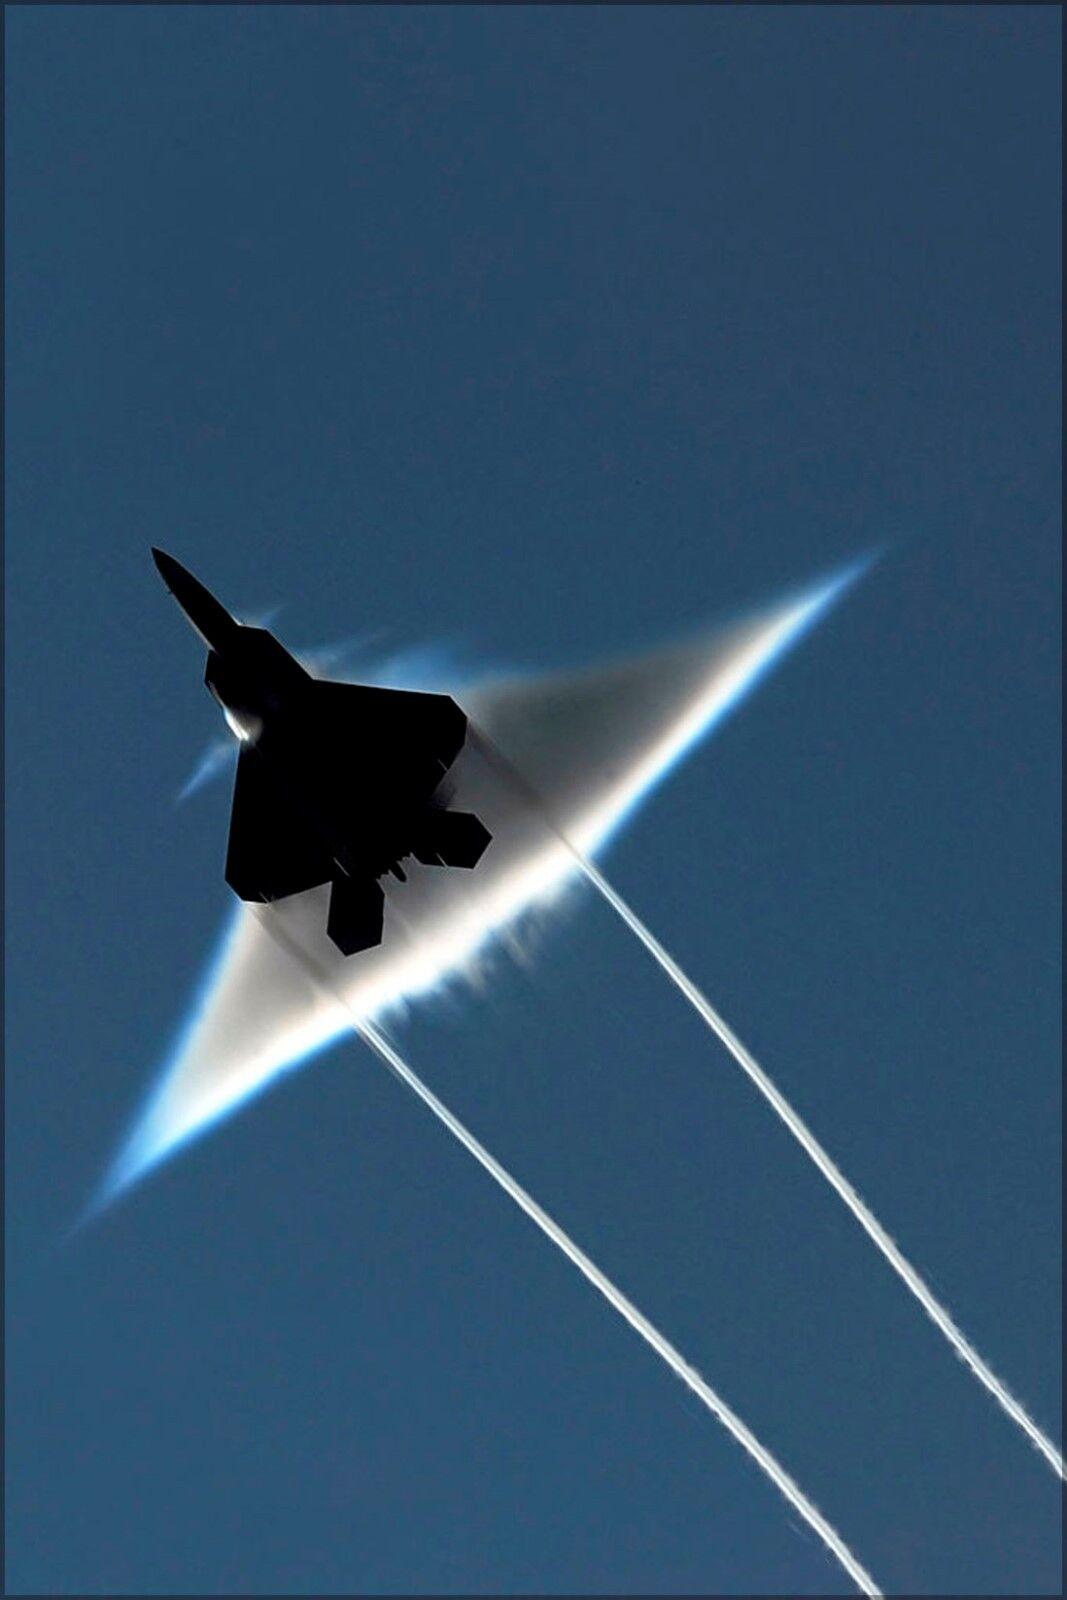 Poster, Many Größes; F-22 Raptor In Transonic Flyby Over Uss John C. Stennis (Cvn